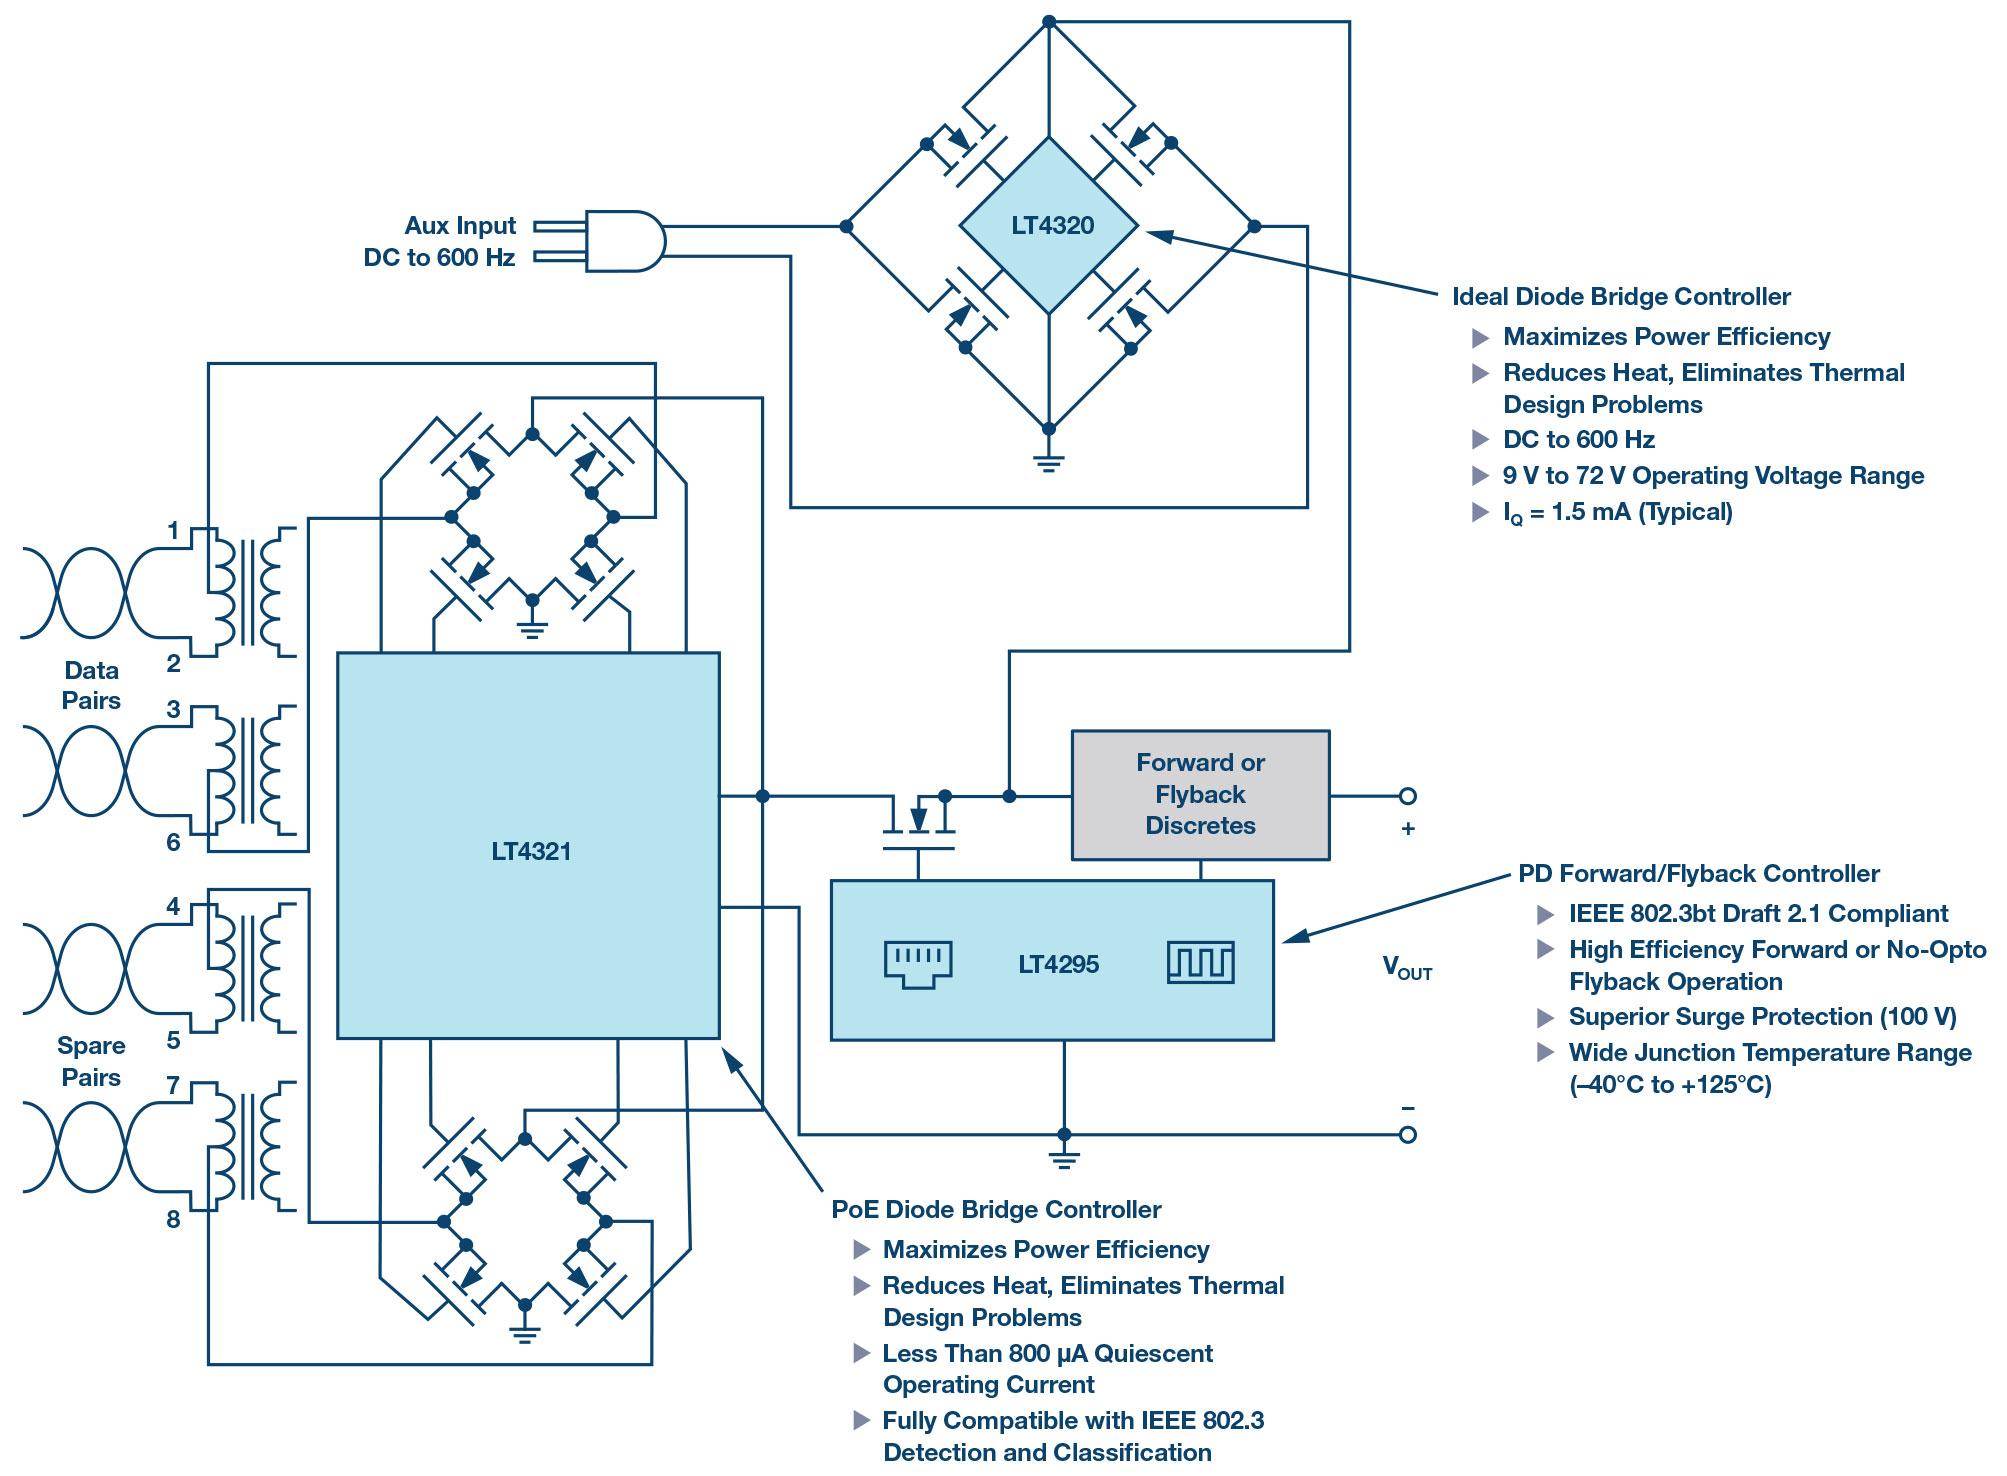 small resolution of figure 71 power supply block diagrams wiring diagram data val figure 71 power supply block diagrams